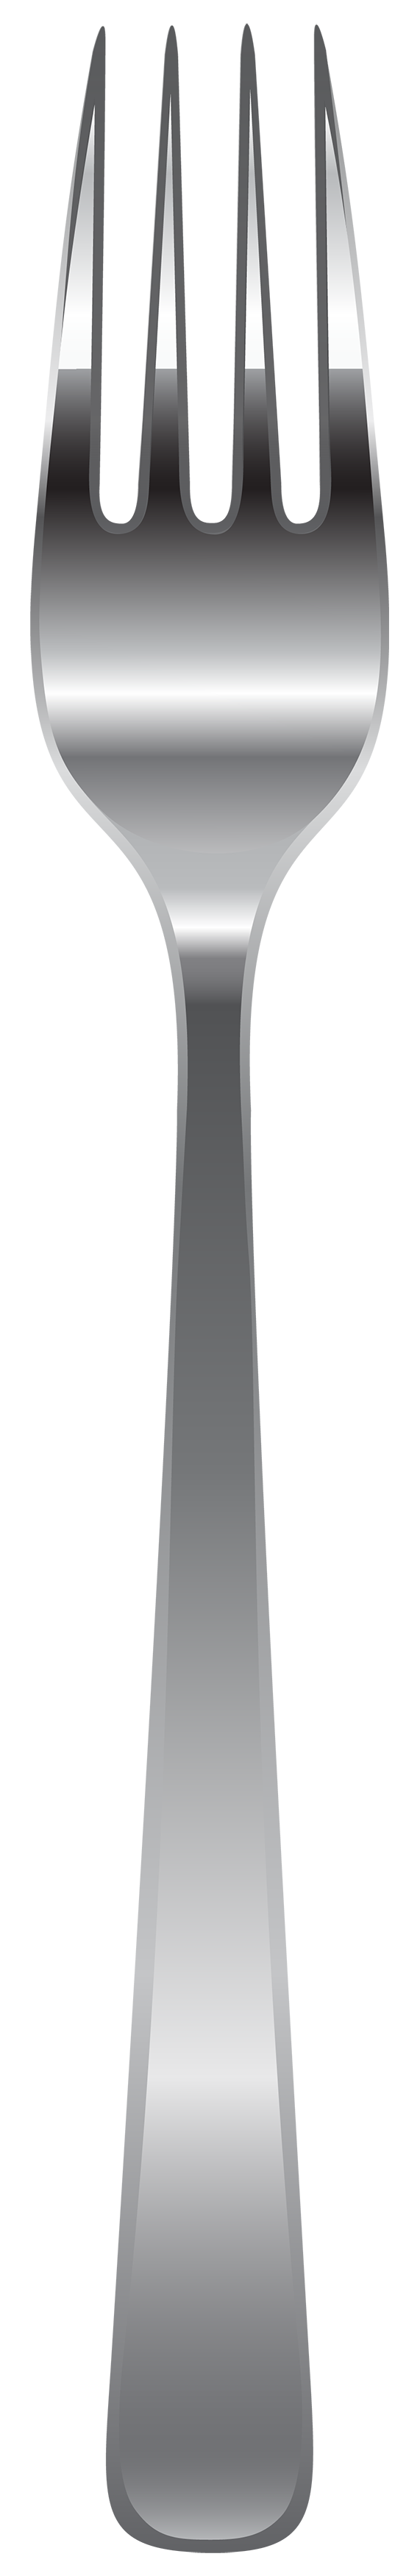 Fork clipart web